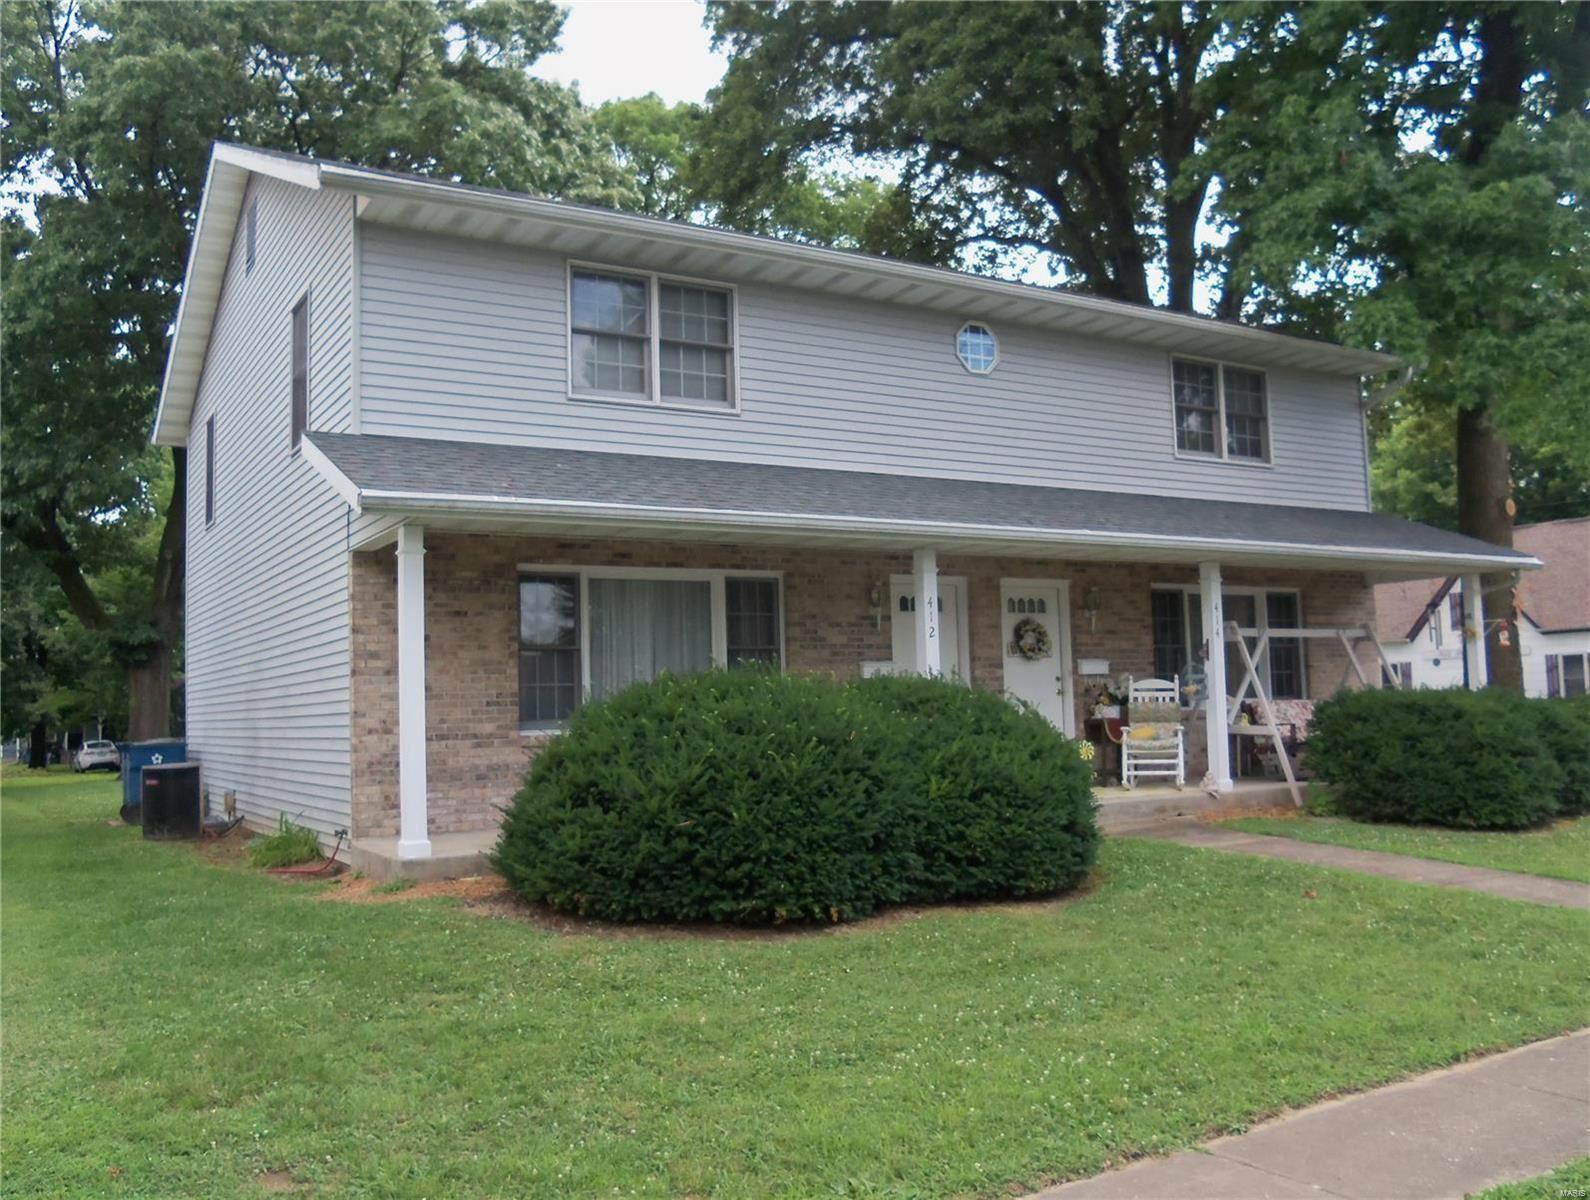 412 Short Street, Collinsville, IL 62234 - MLS#: 20051747